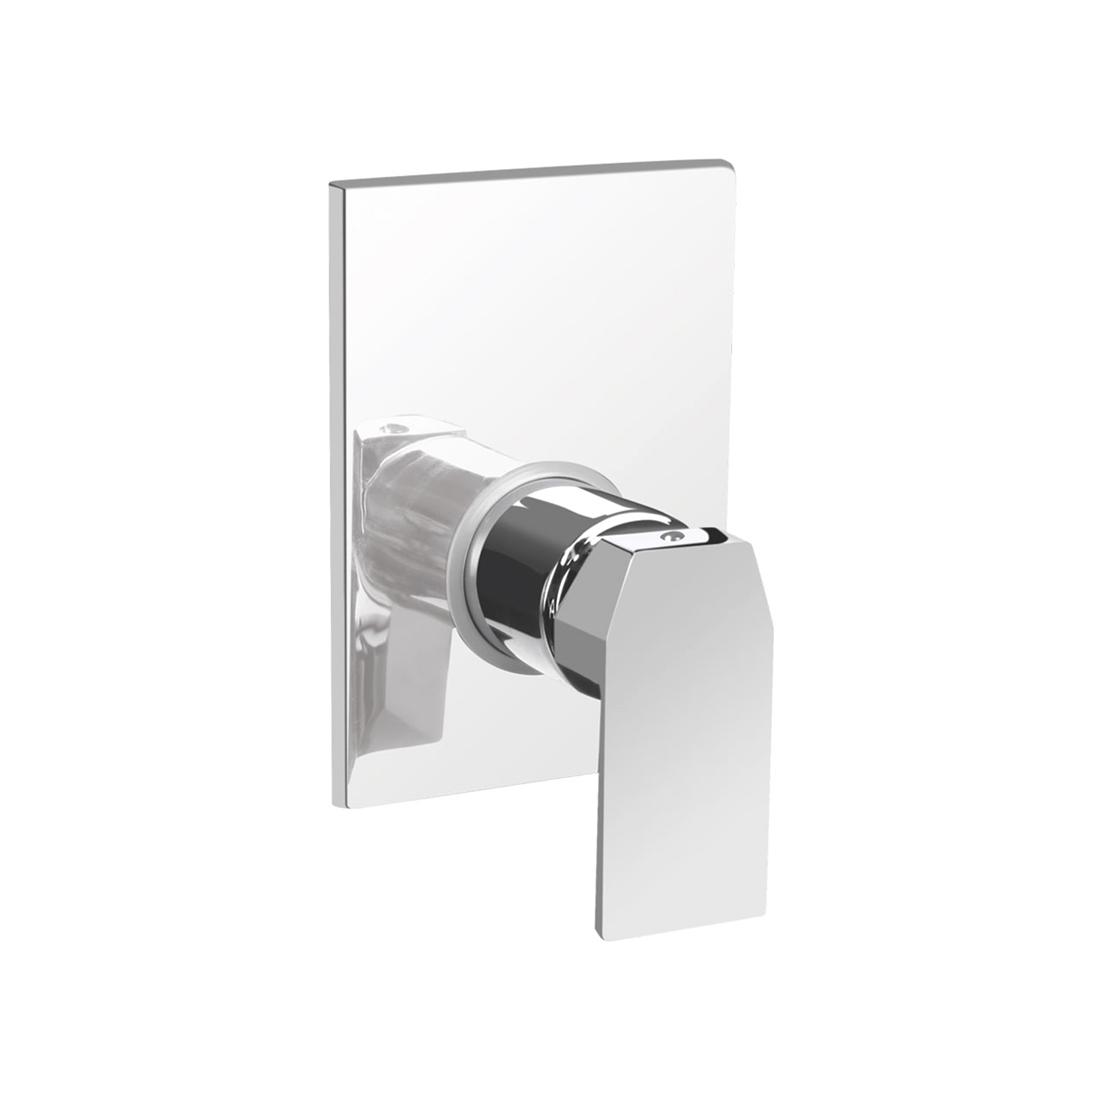 Kerovit Qua KB1011015 Single Lever 2-Inlet Concealed Shower Mixer Trim